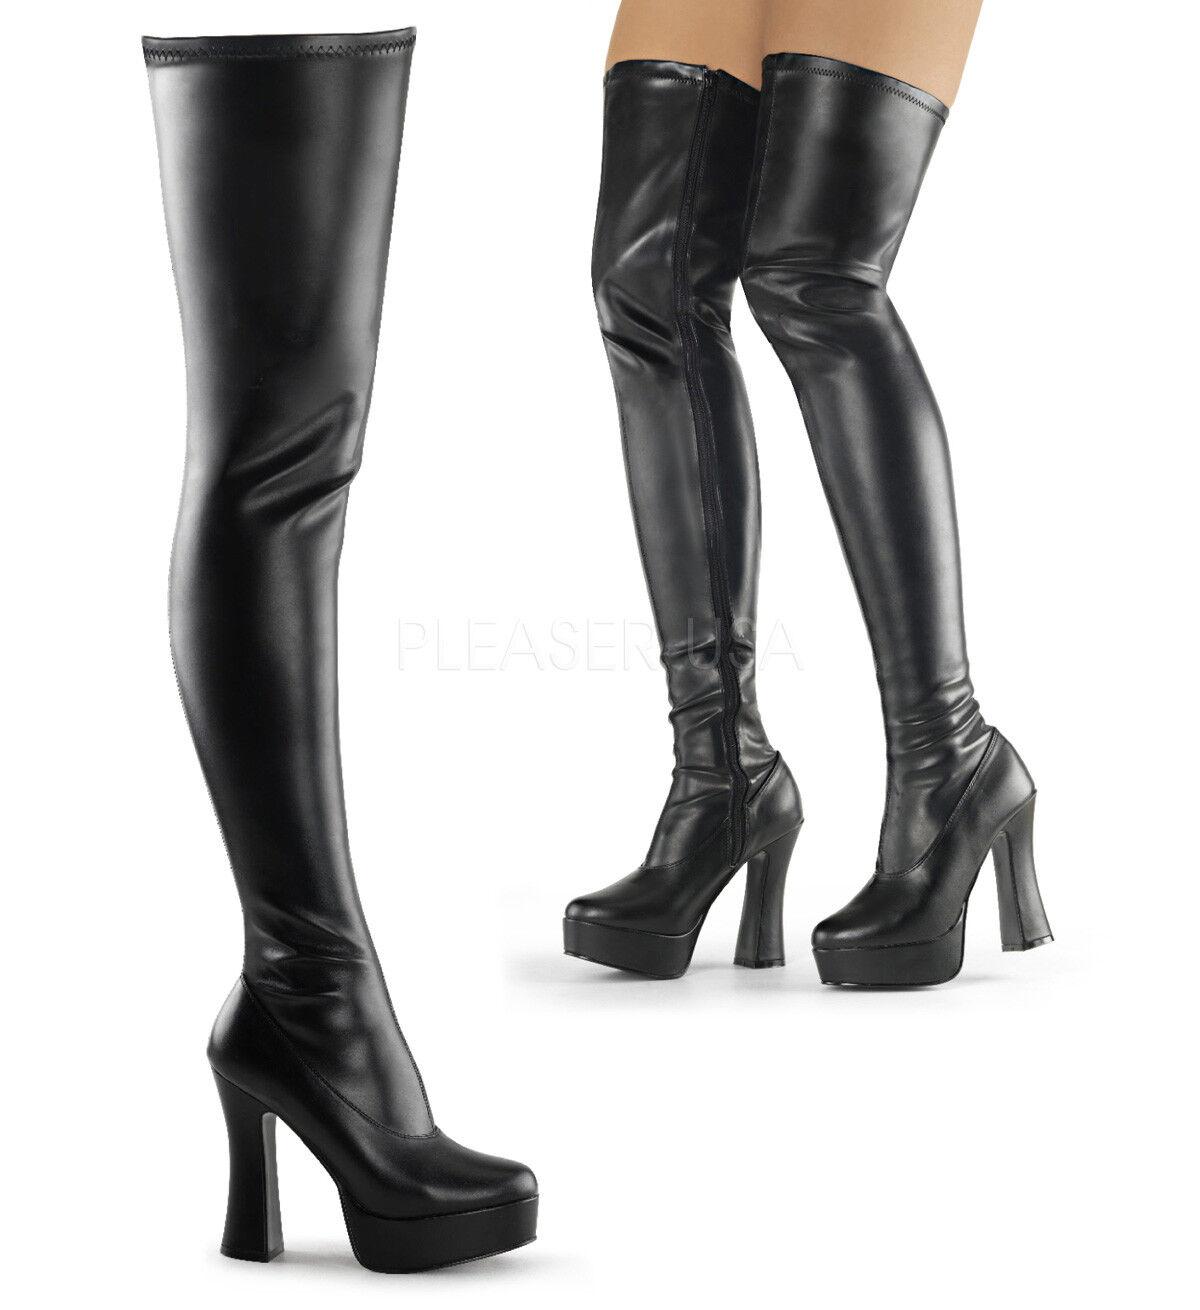 Pleaser ELECTRA-3000Z Platforms Exotic Dancing Black Faux Leather Matte Boots